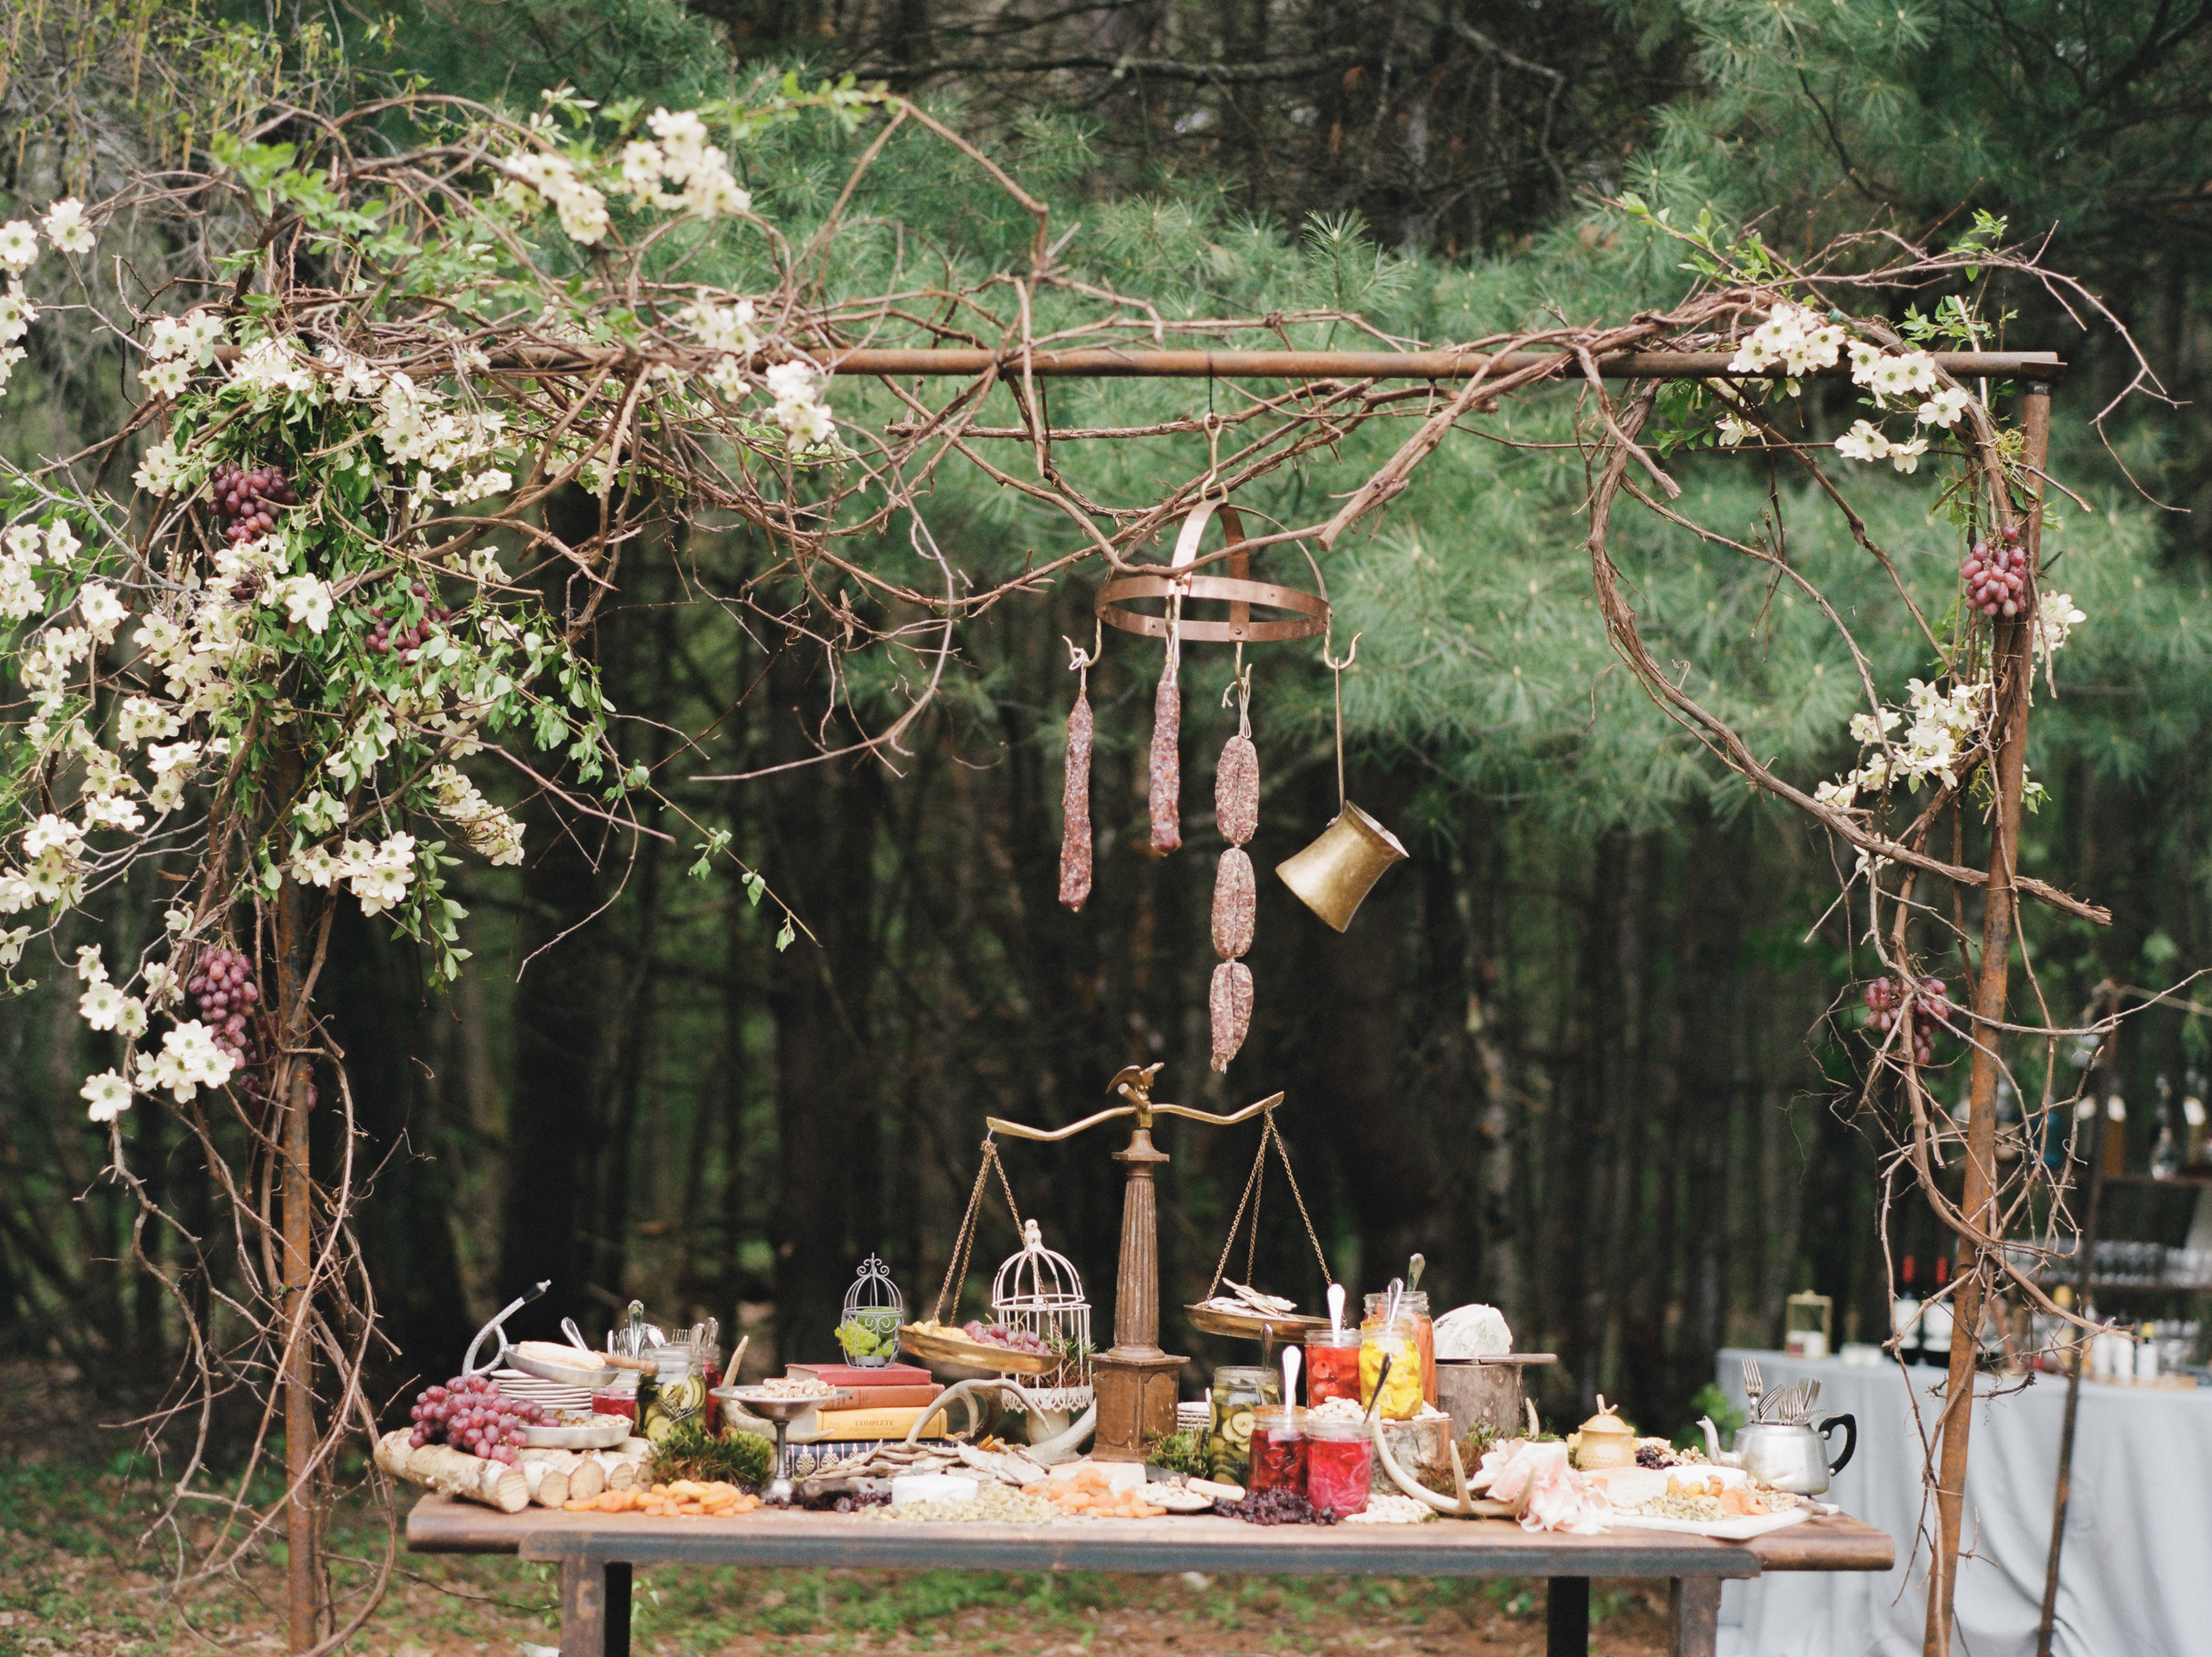 Amherst Ma wedding Photography